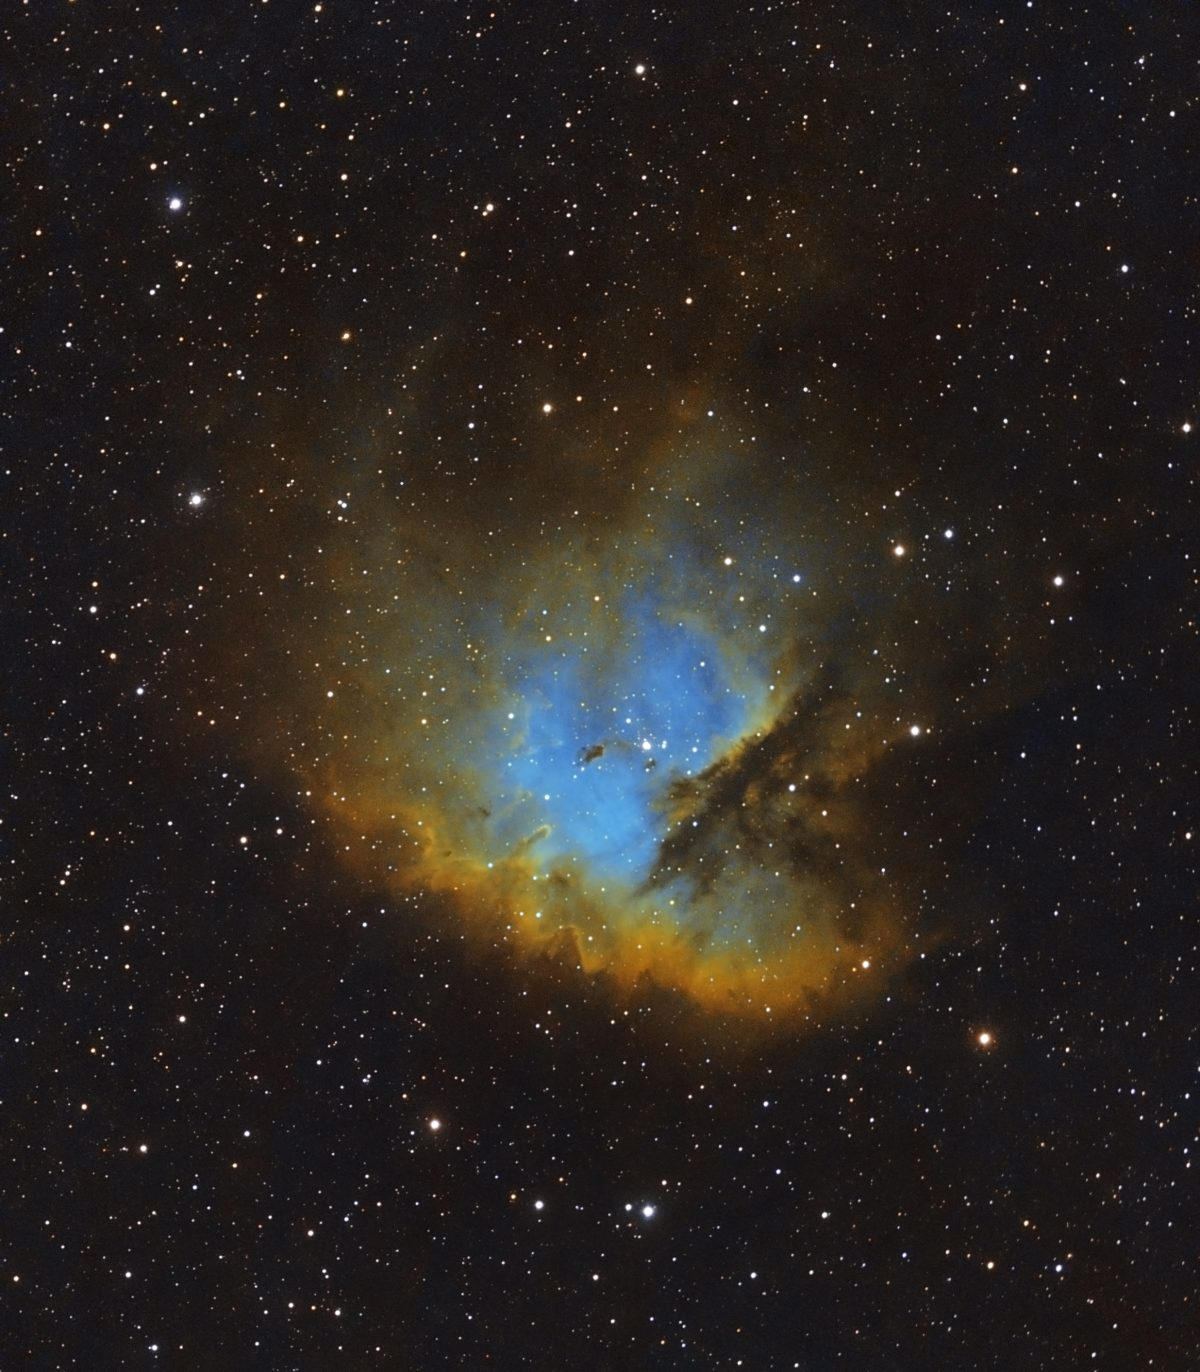 Pacman HST 1200x1372 - PACMAN NEBULA NGC 281